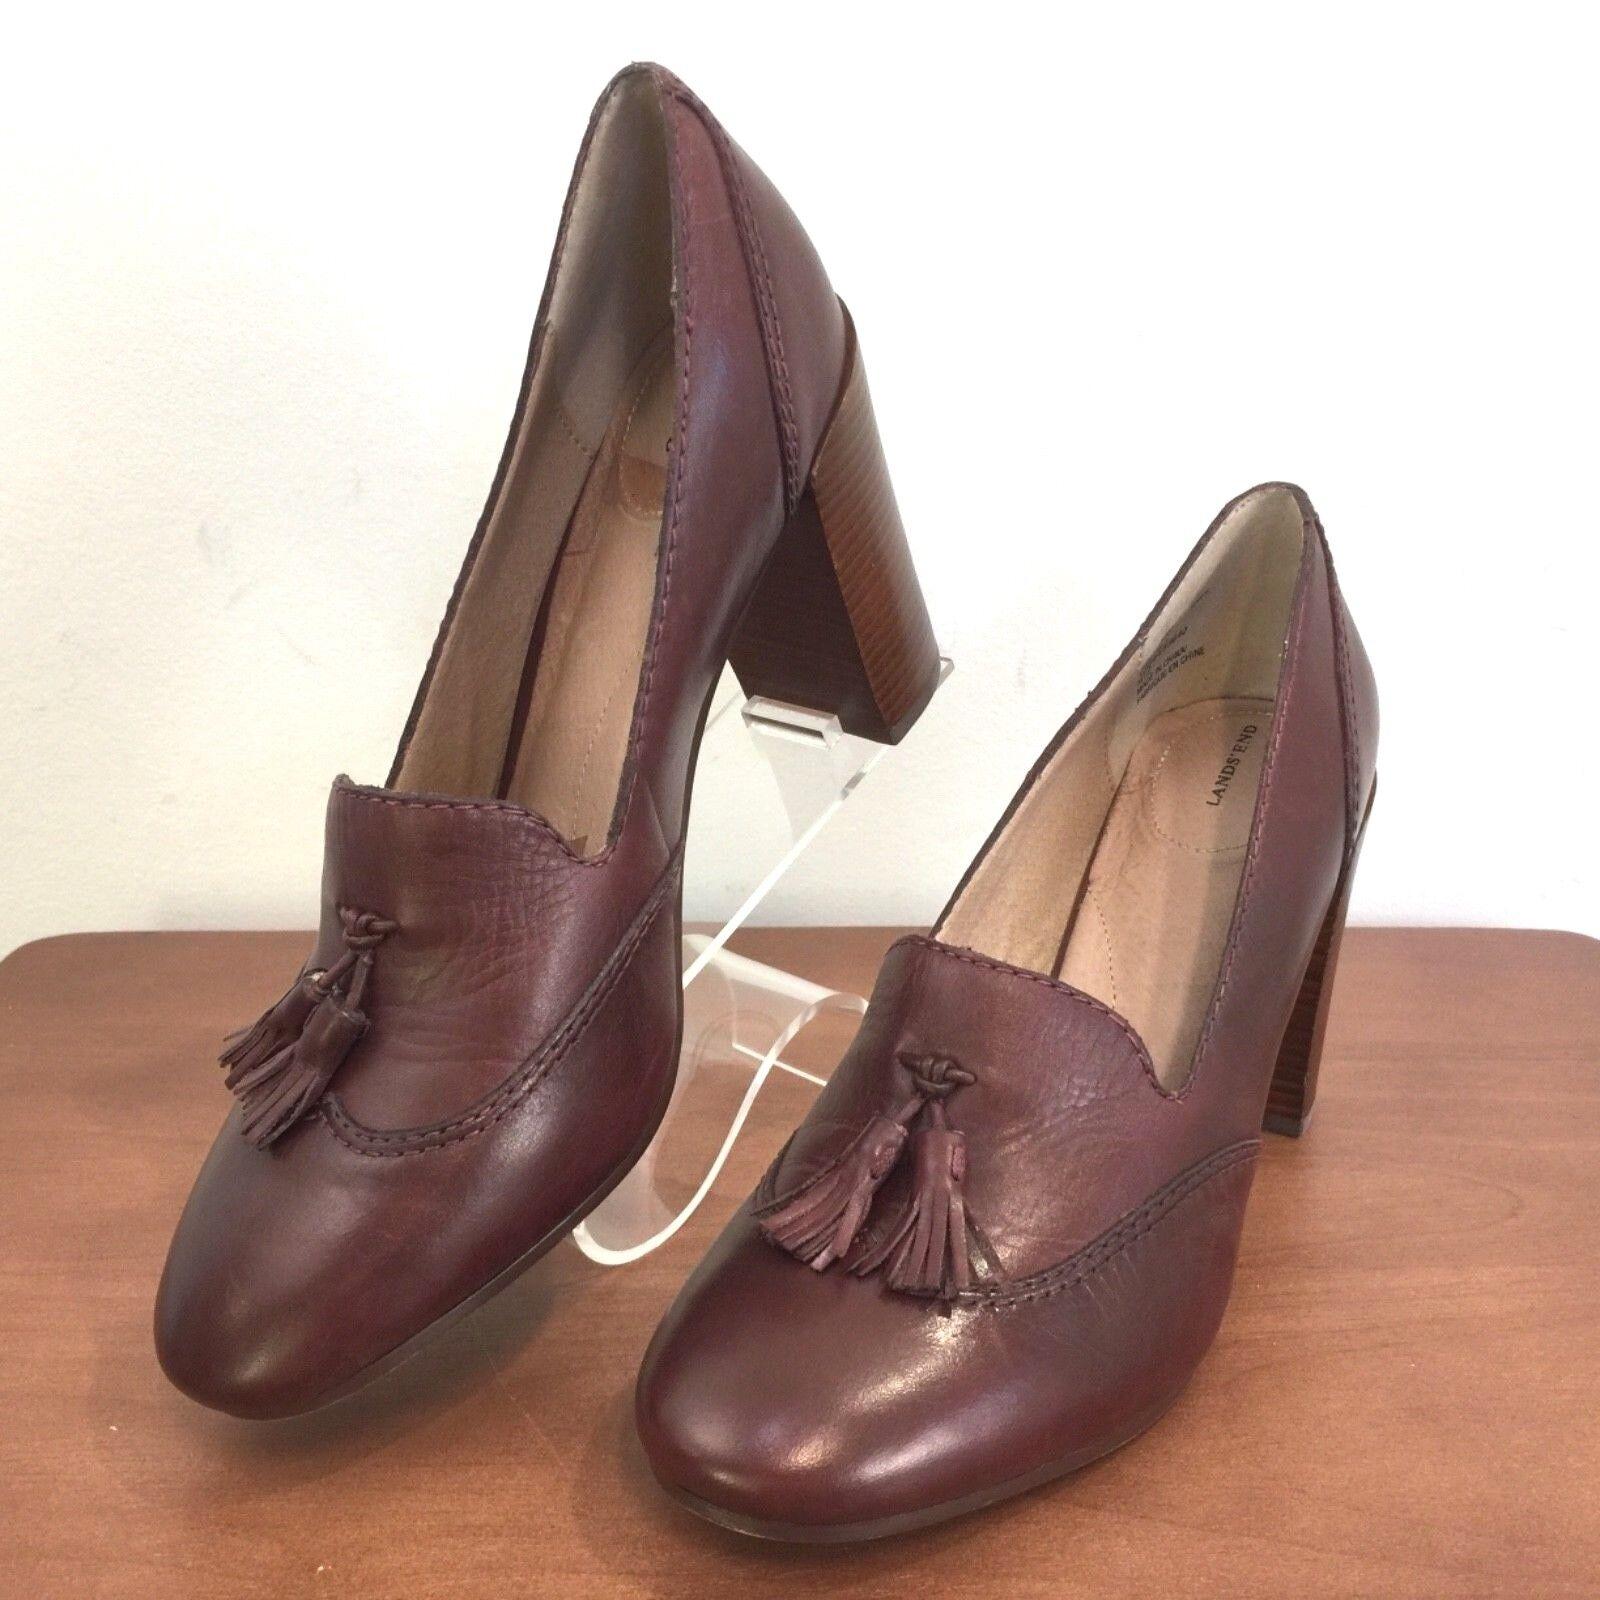 Lands End Stowe Sz 8B Burgundy Leather High Heel Tassel Pumps chaussures femmes 8B